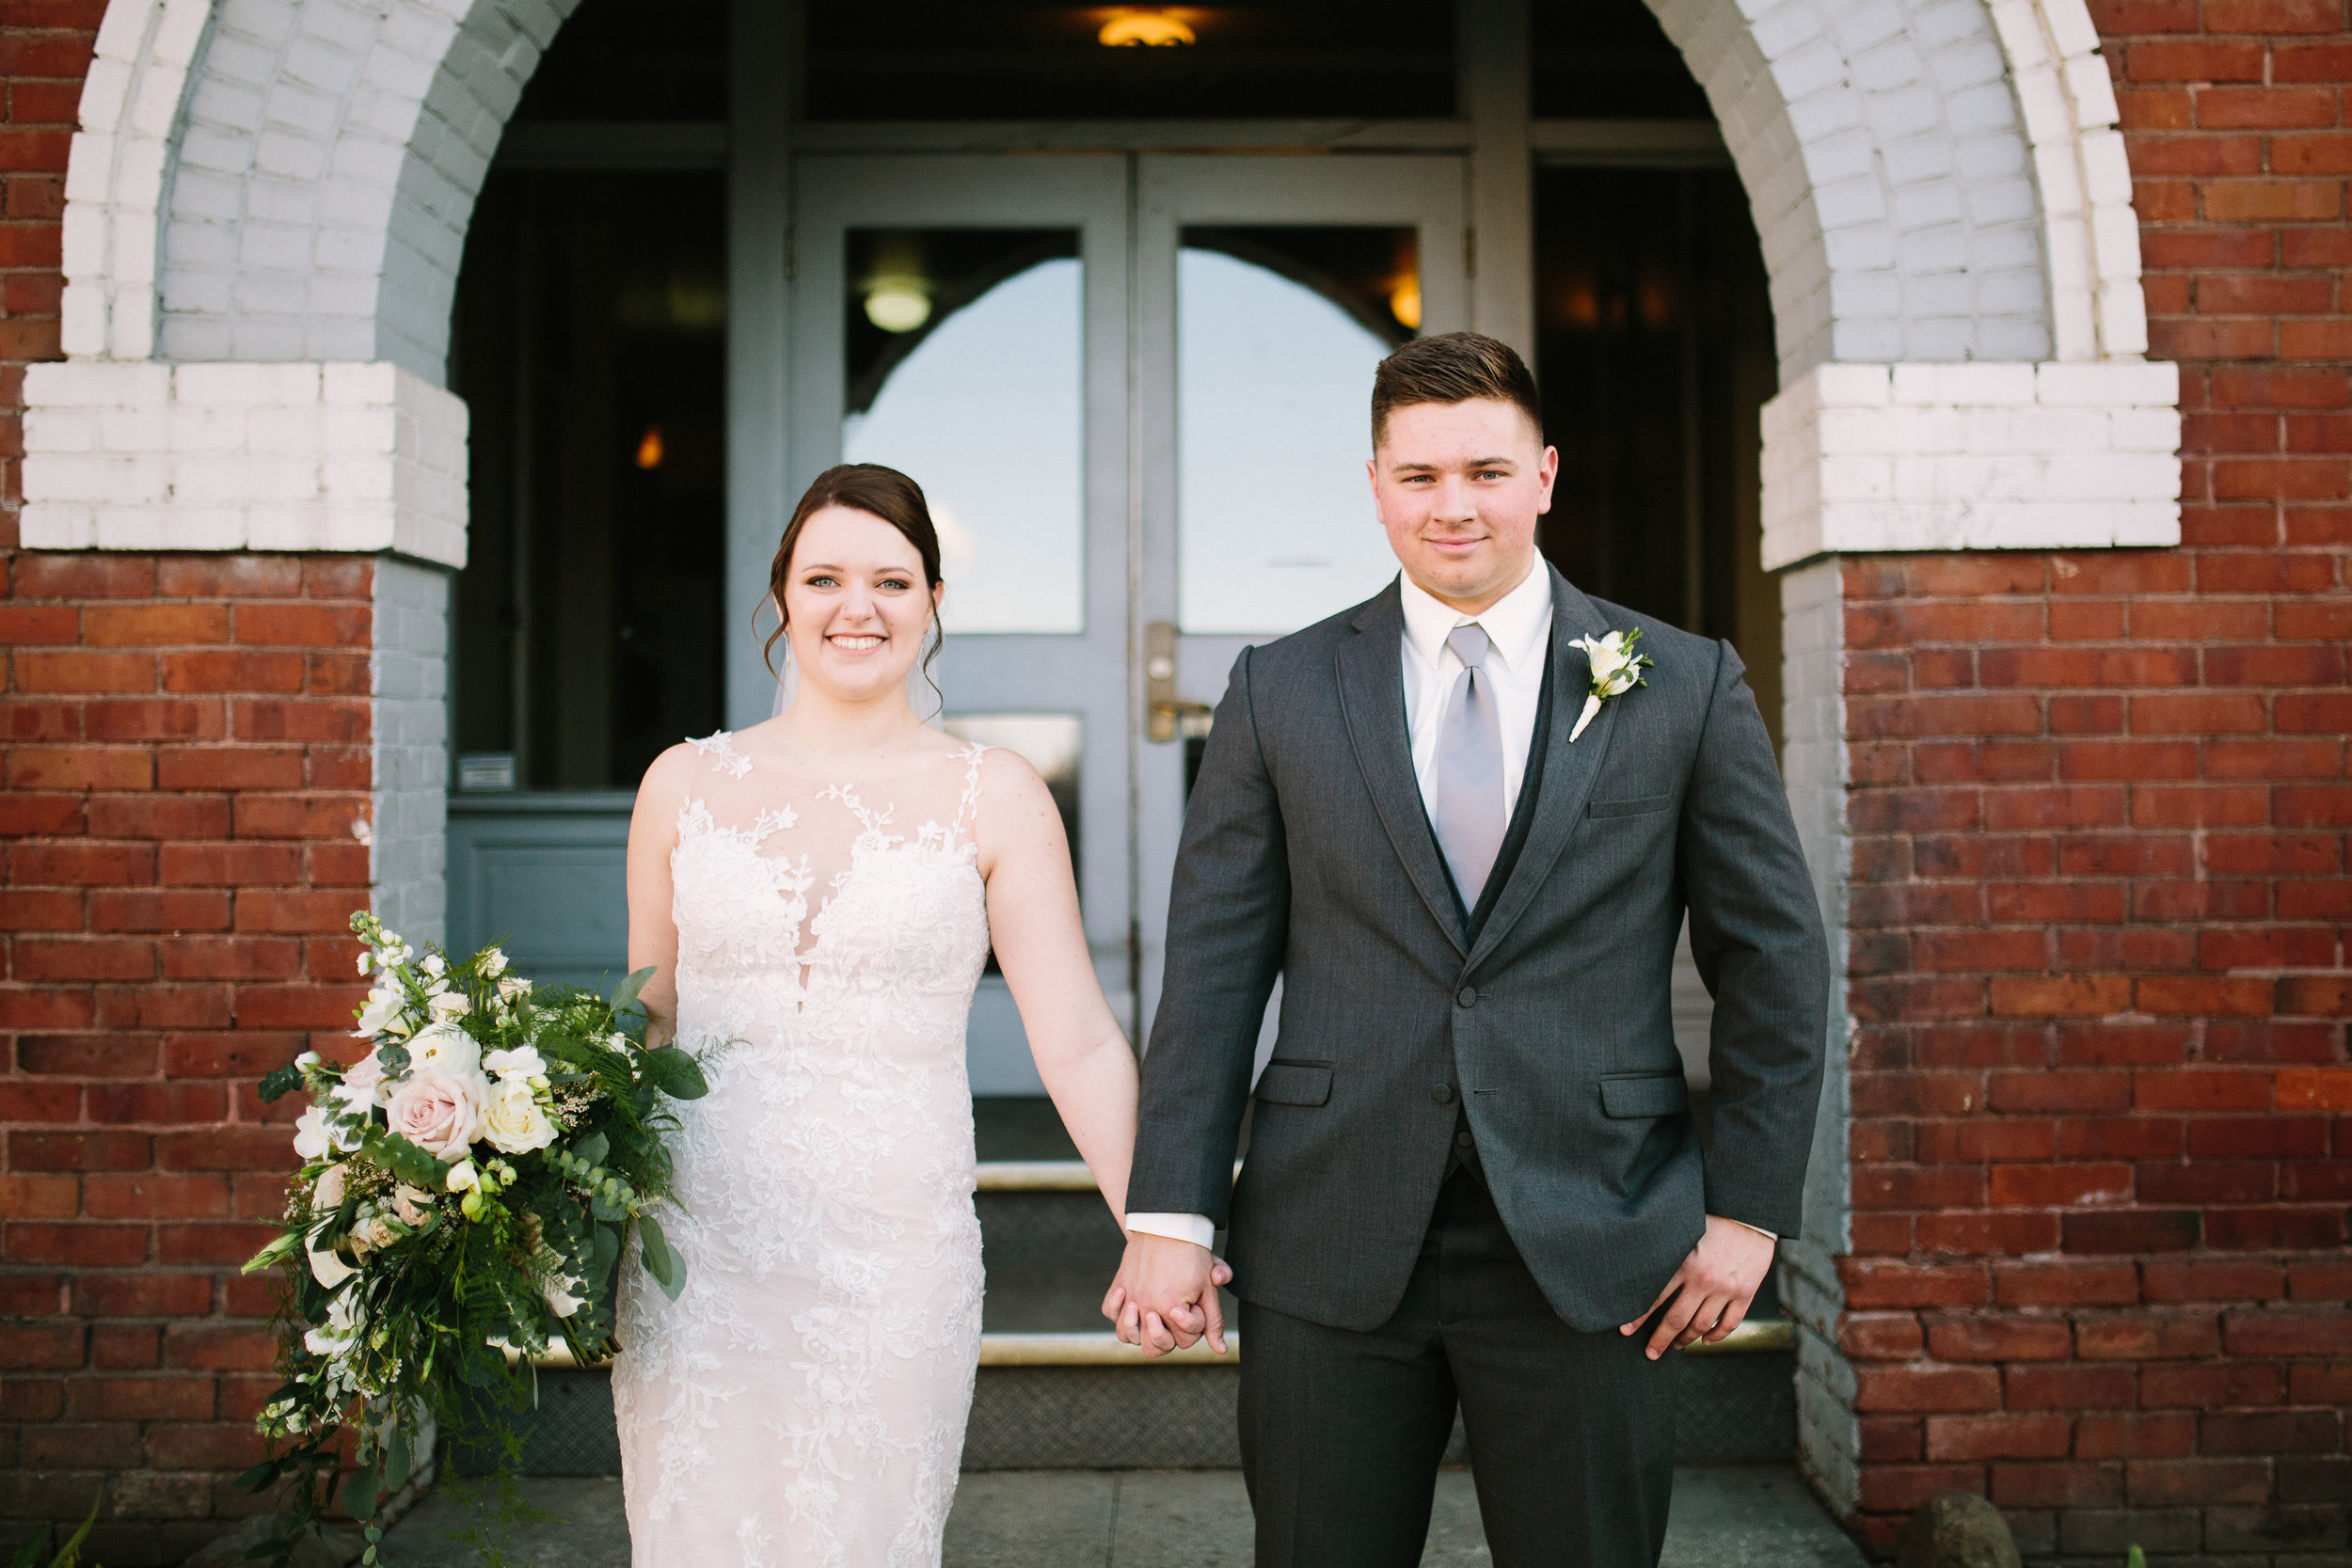 Fun Rustic spokane wedding holding hands with bouquet